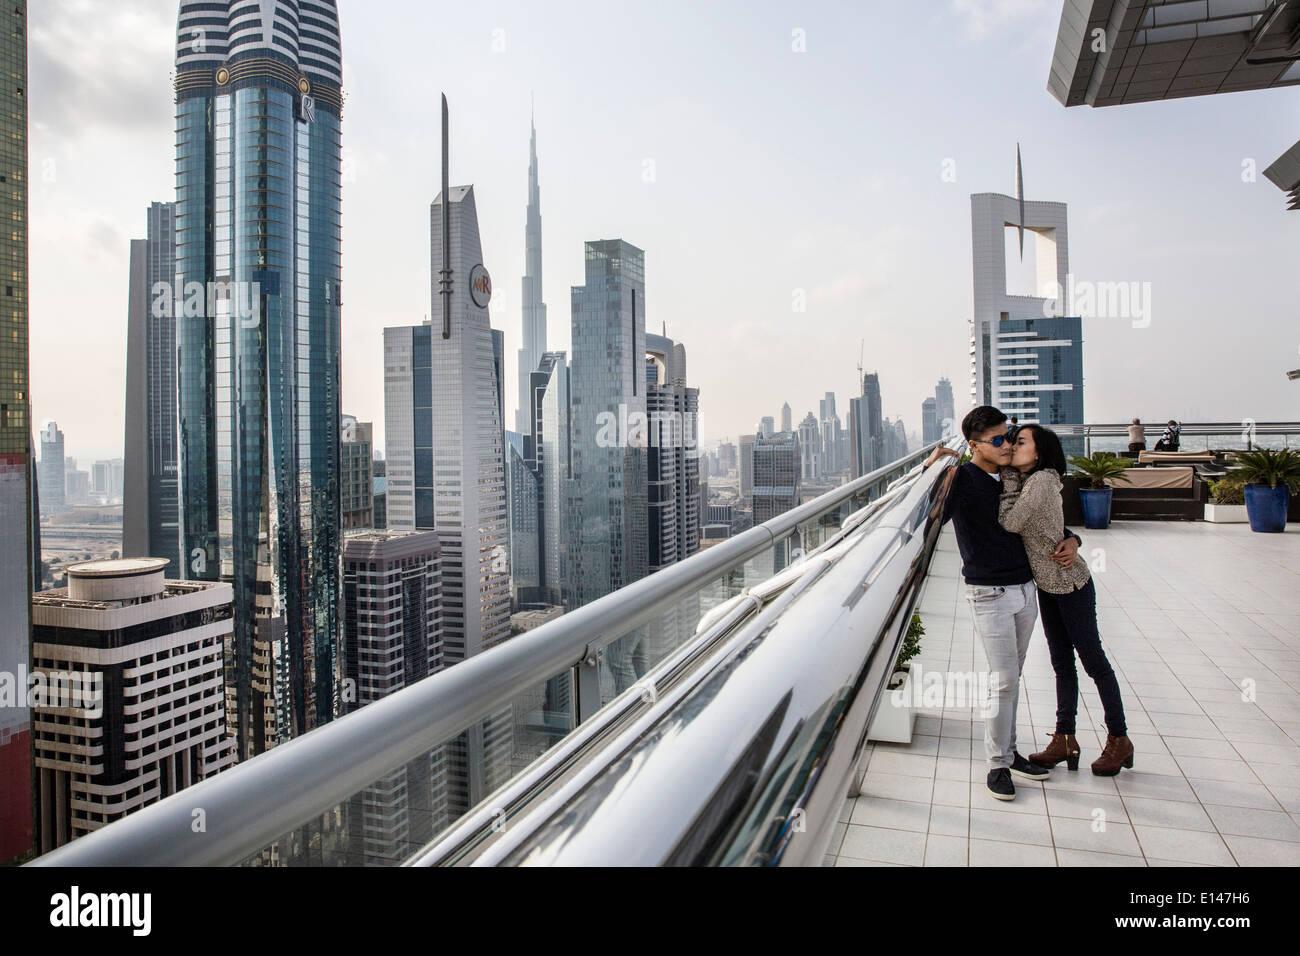 Los Emiratos Árabes Unidos, Dubai, centro financiero con Burj Khalifa, Asiáticos pareja besándose en la azotea de la onu de Sheraton Hotel Imagen De Stock